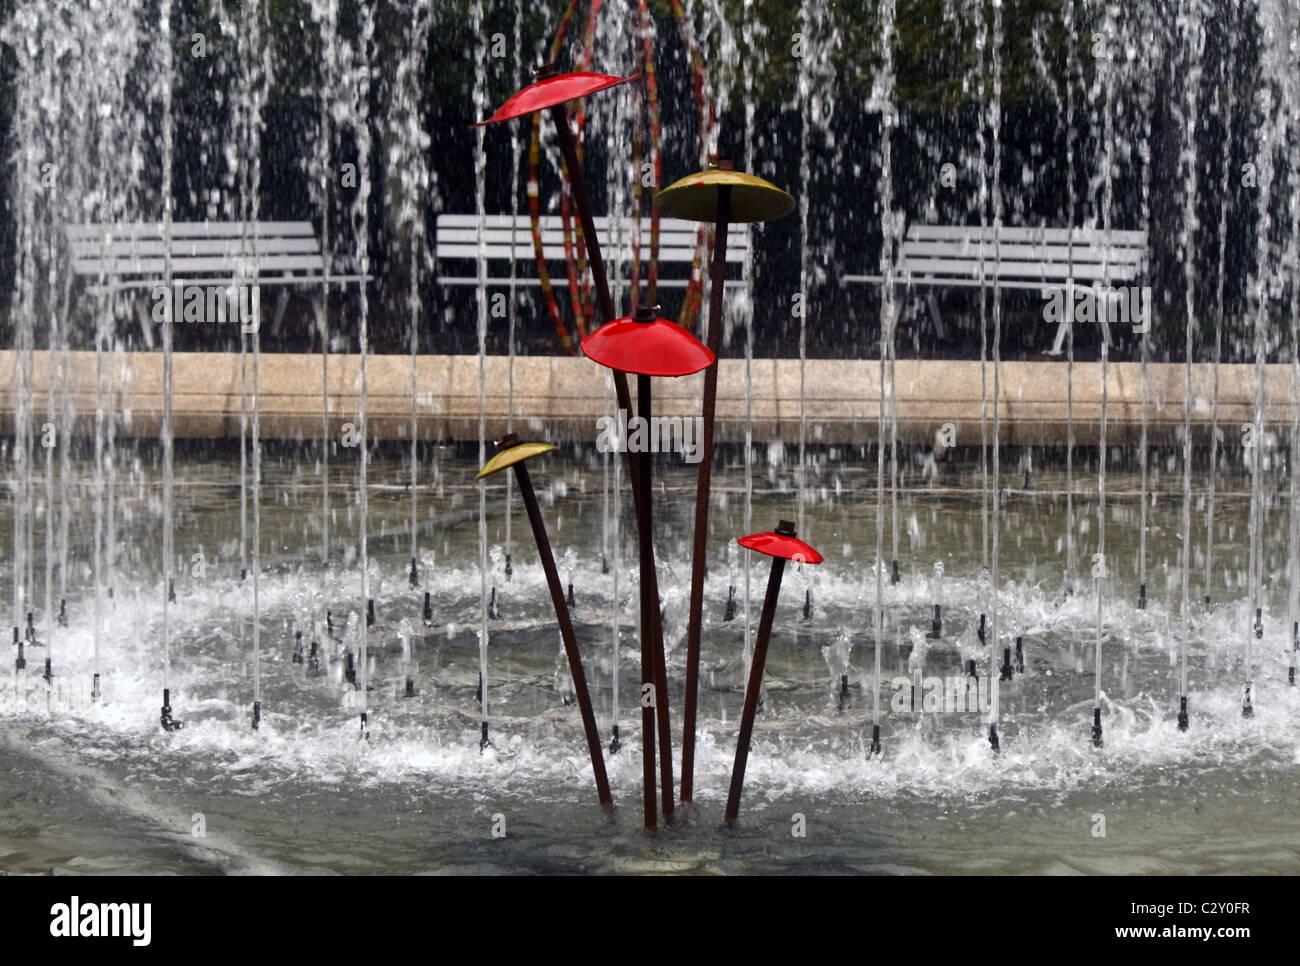 Springbrunnen Garten Fontaene Stock Photos& Springbrunnen Garten Fontaene Stock Images Alamy